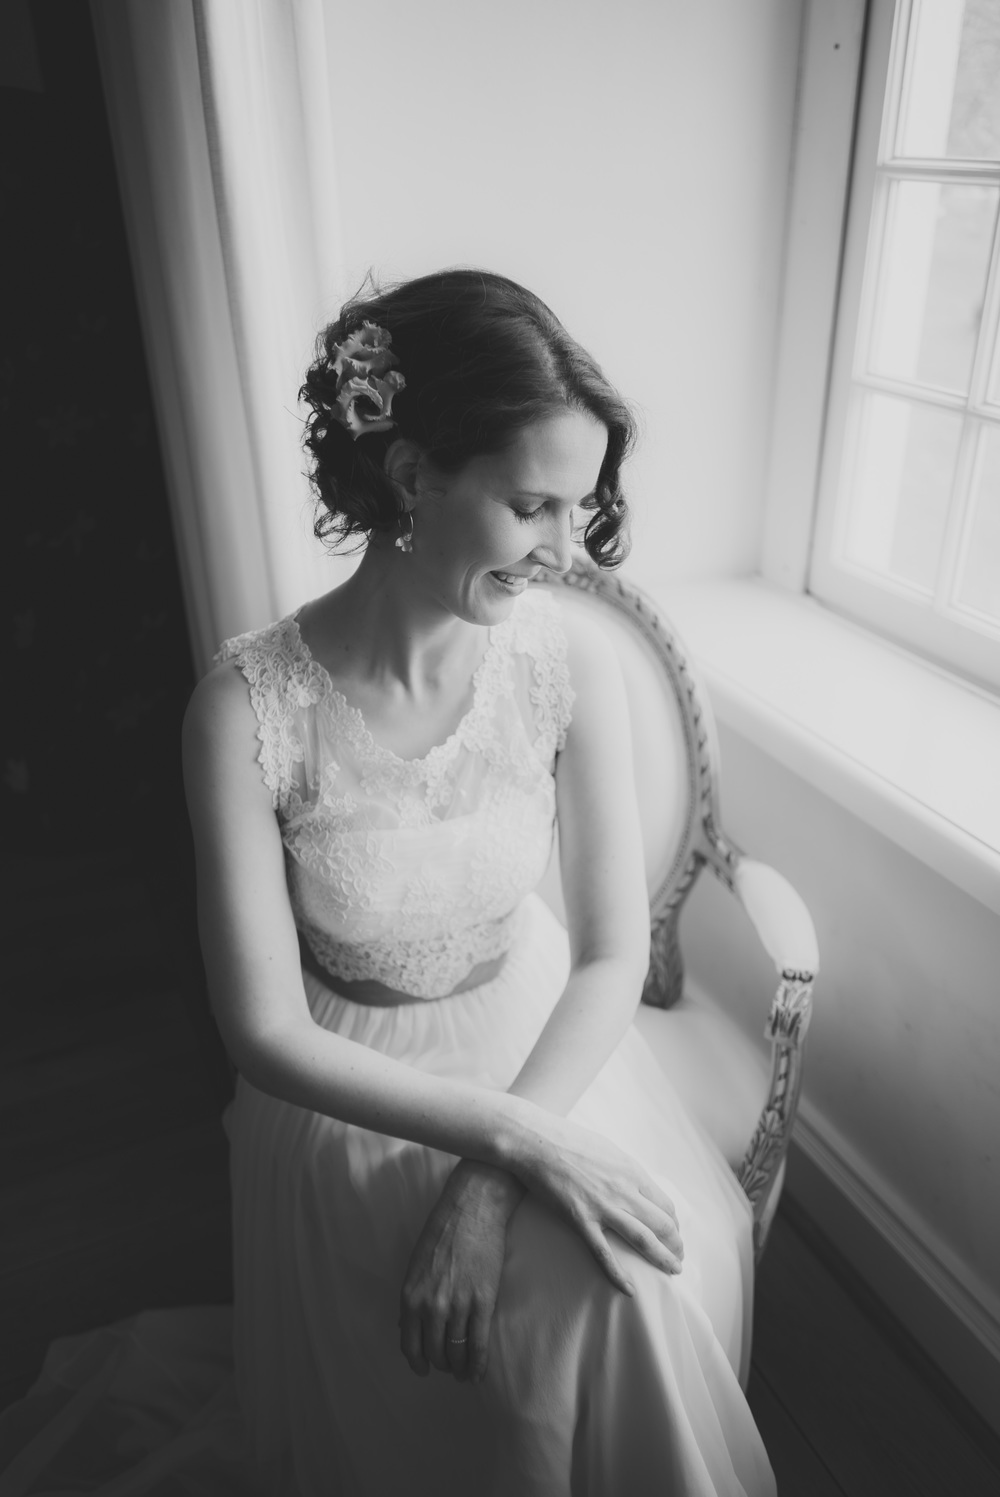 Hochzeitsfotograf-Schlossruine-Hertefeld-Weeze-012.jpg